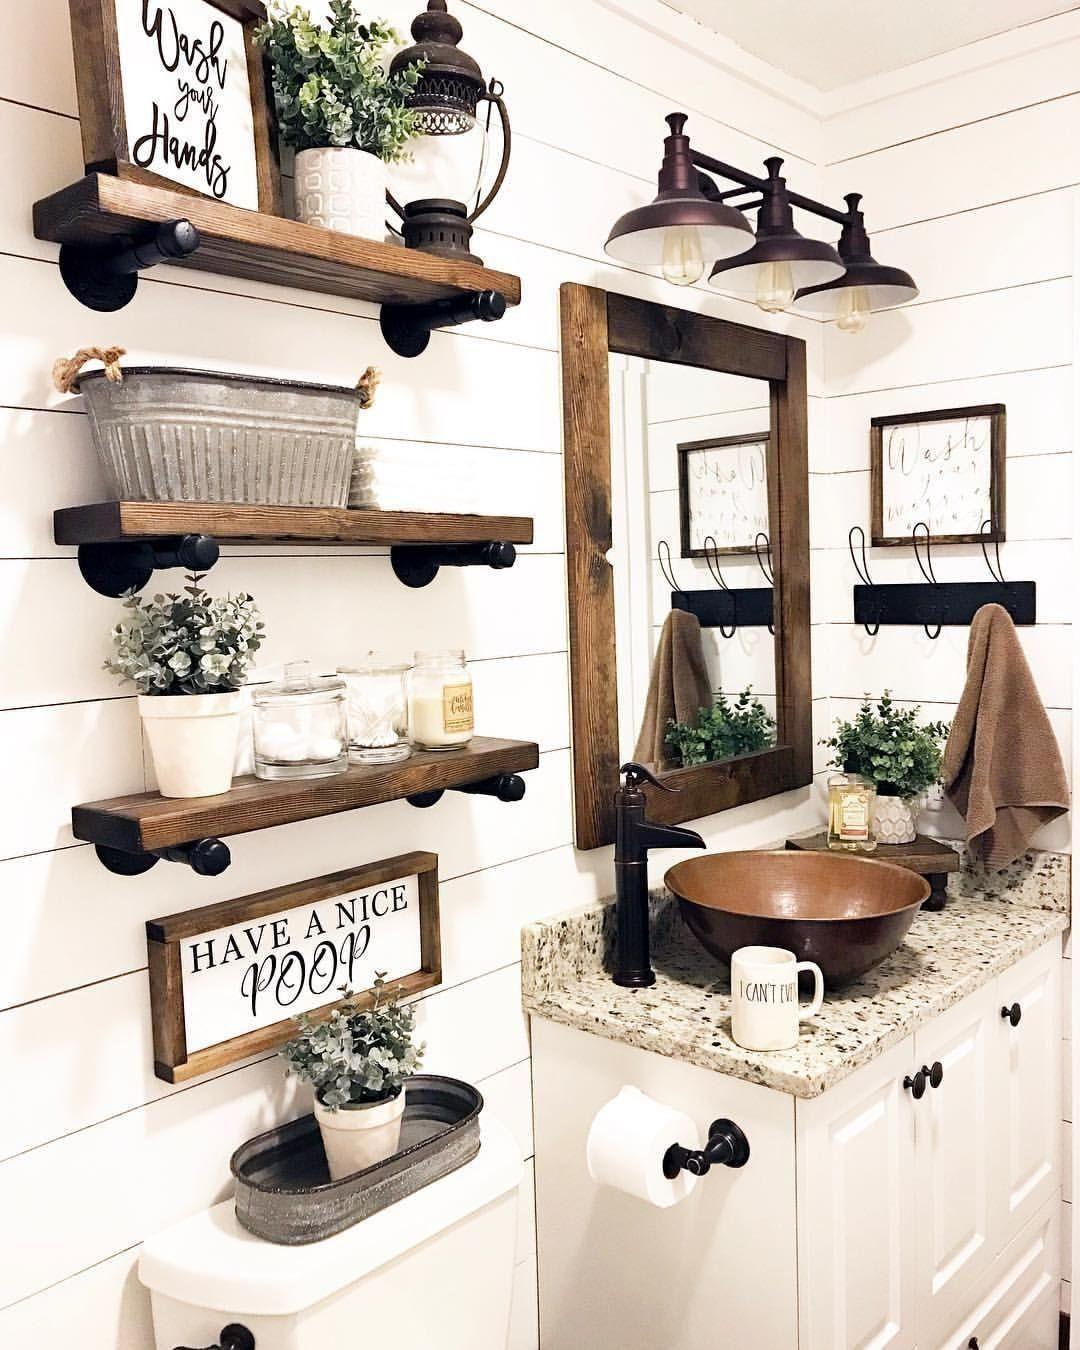 25 Cozy Rustic Bathroom Decor To Guide Your Renovation - W17